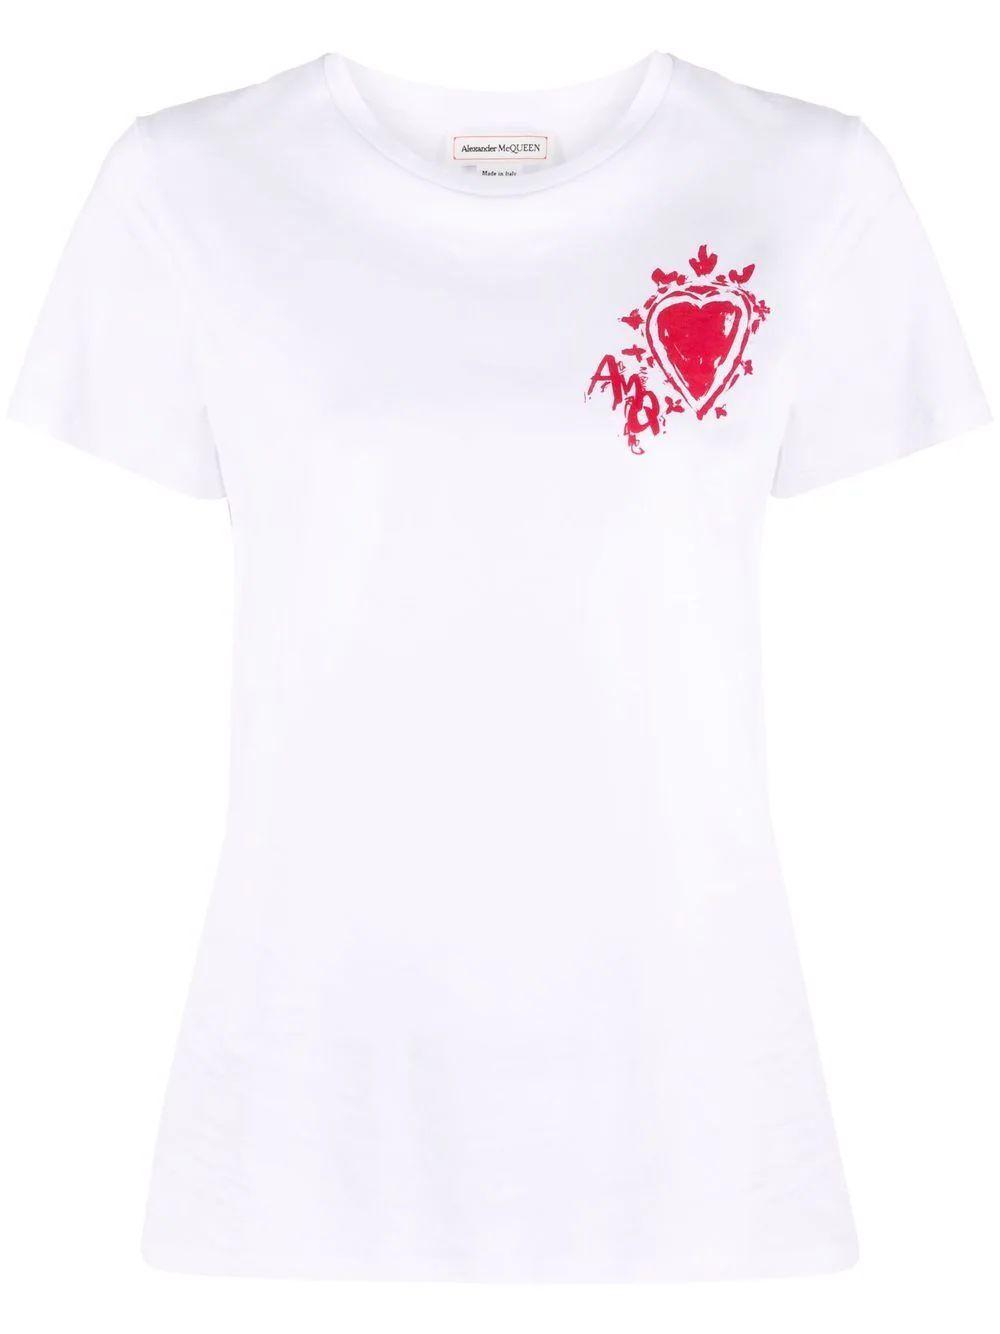 Painted Heart T- Shirt Item # 608614QZADJ